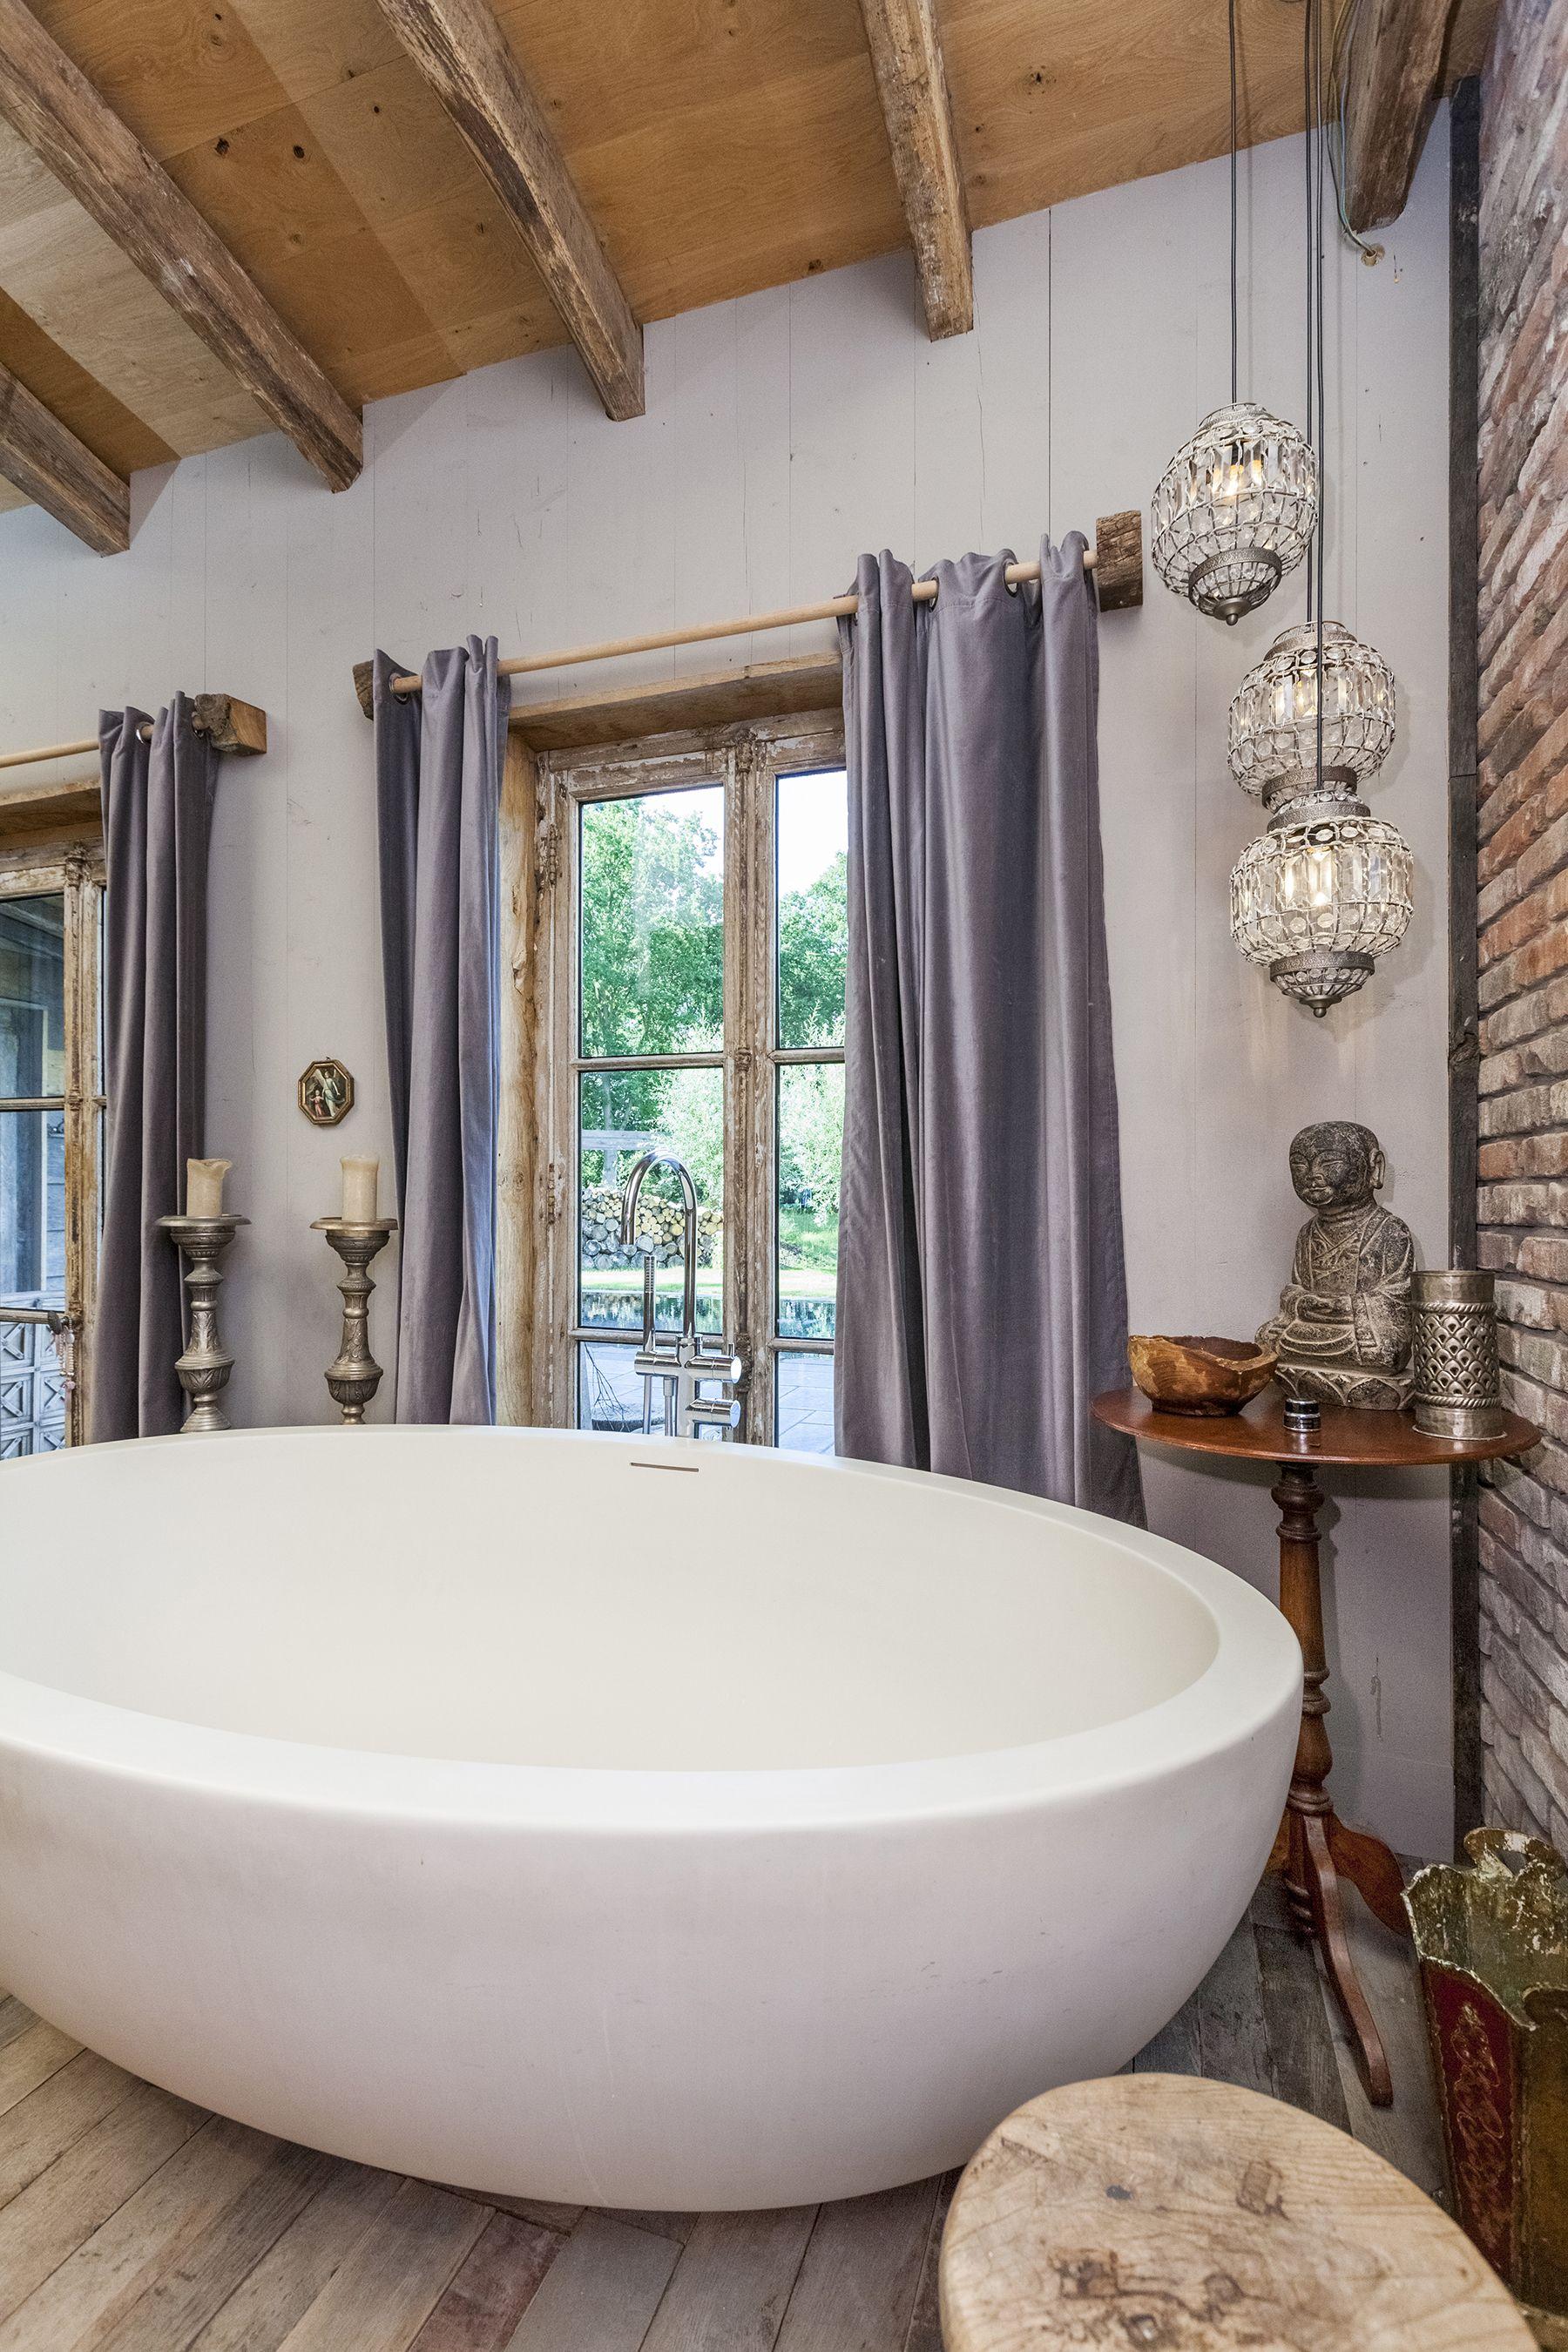 Biggest. #bath #bathtub #Realestate #Photography #ambience